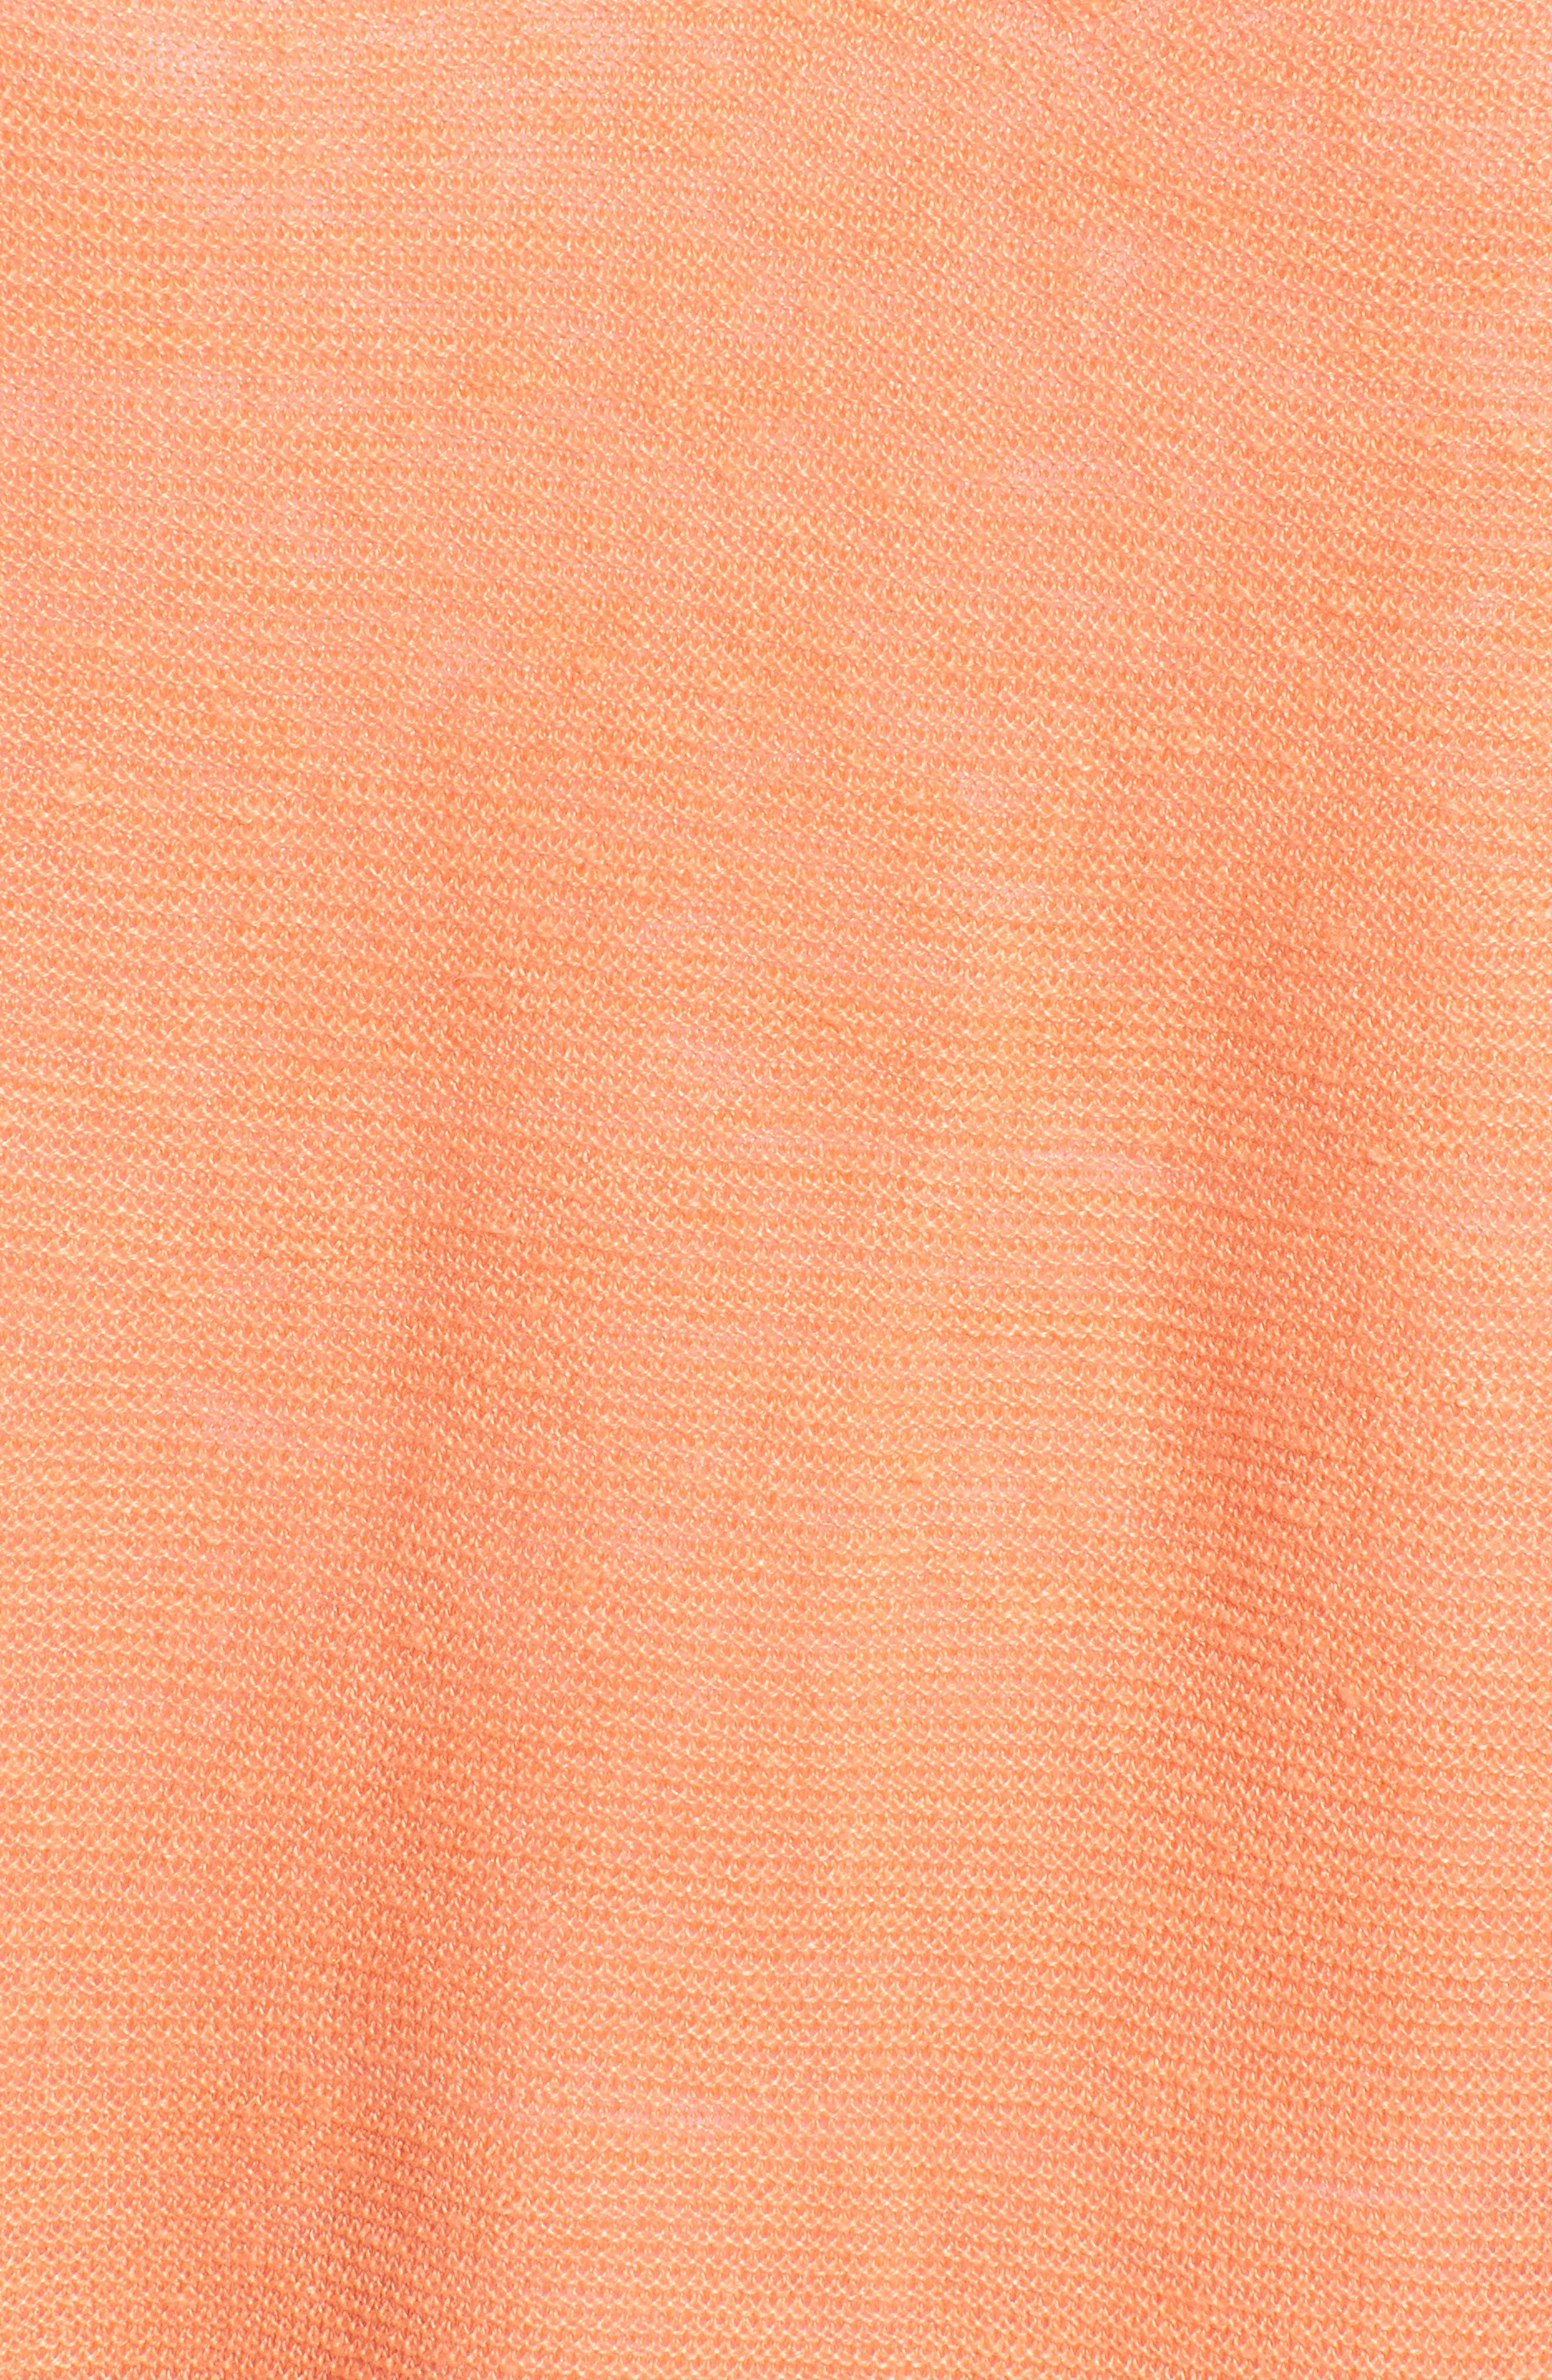 V-Neck Organic Linen Top,                             Alternate thumbnail 6, color,                             Arabesque